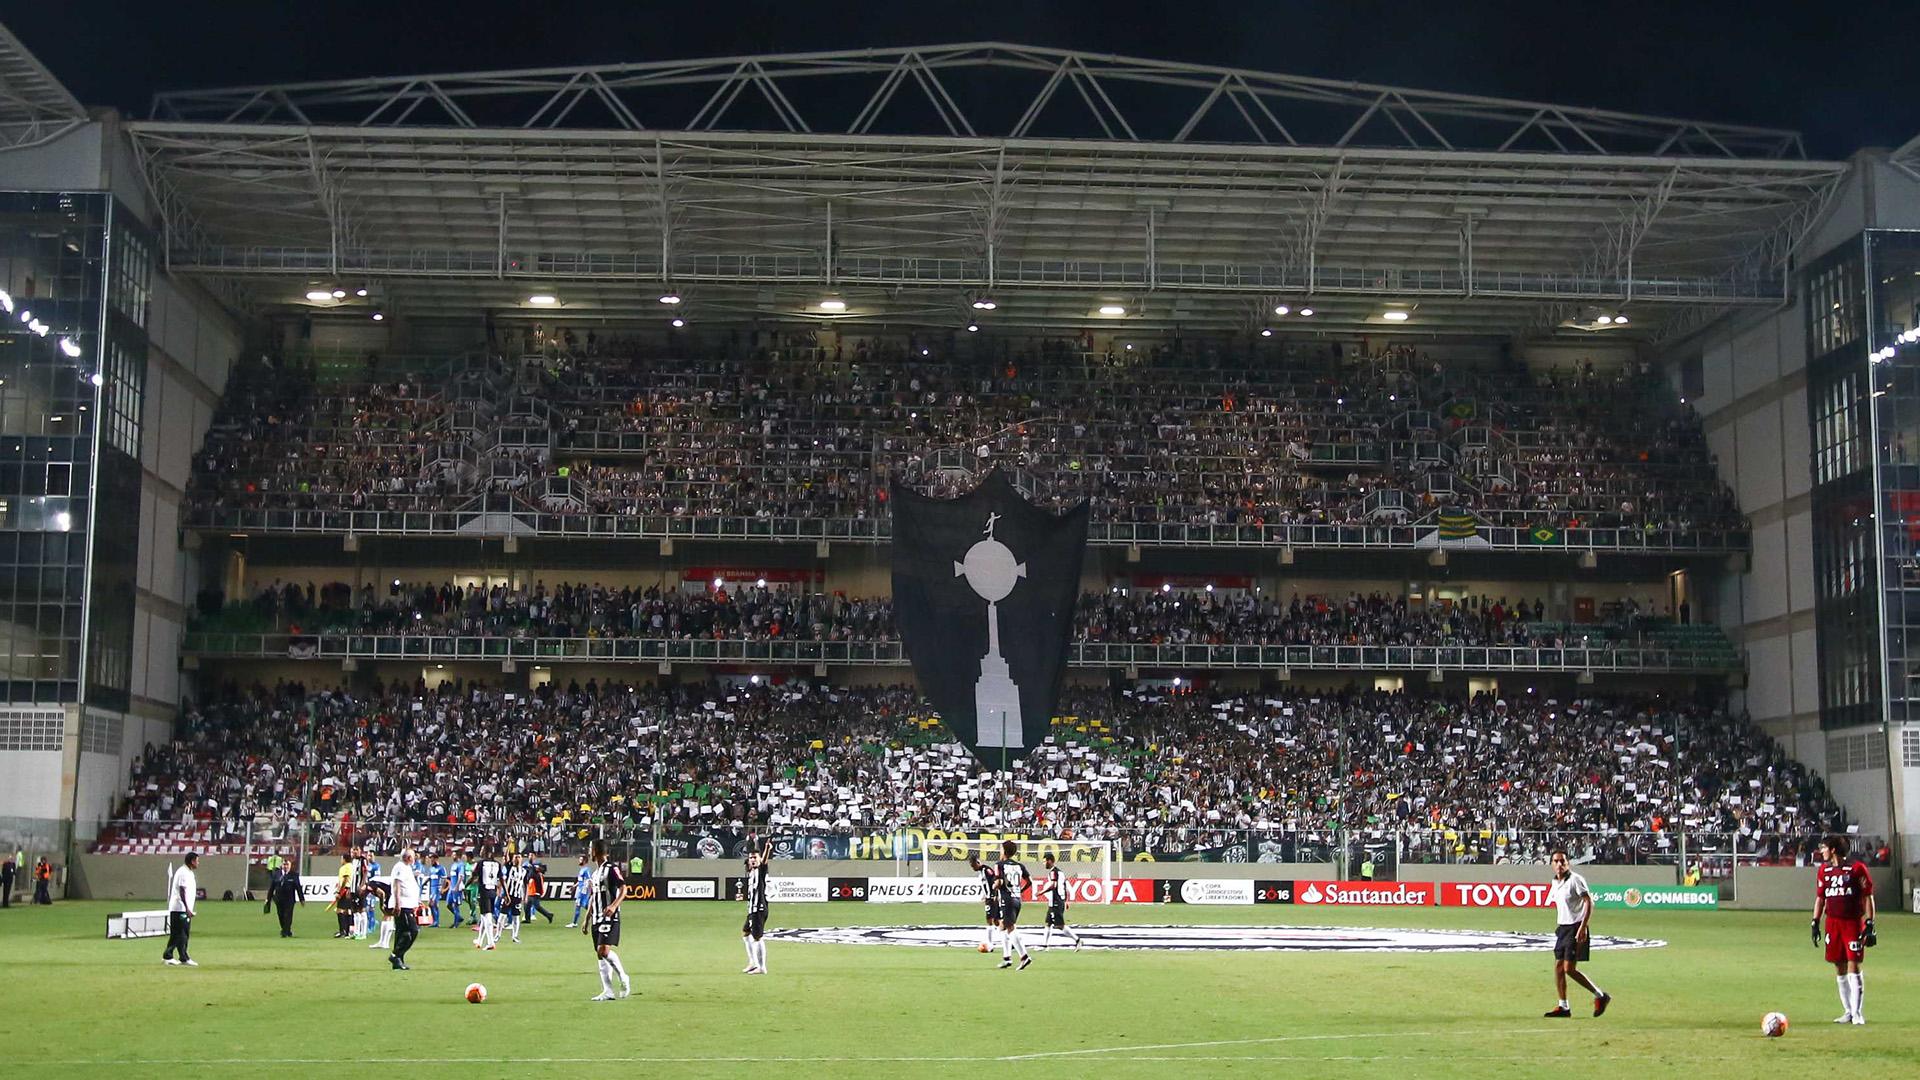 Arena Independência Atlético-MG Racing Club Copa Libertadores R16 04052016